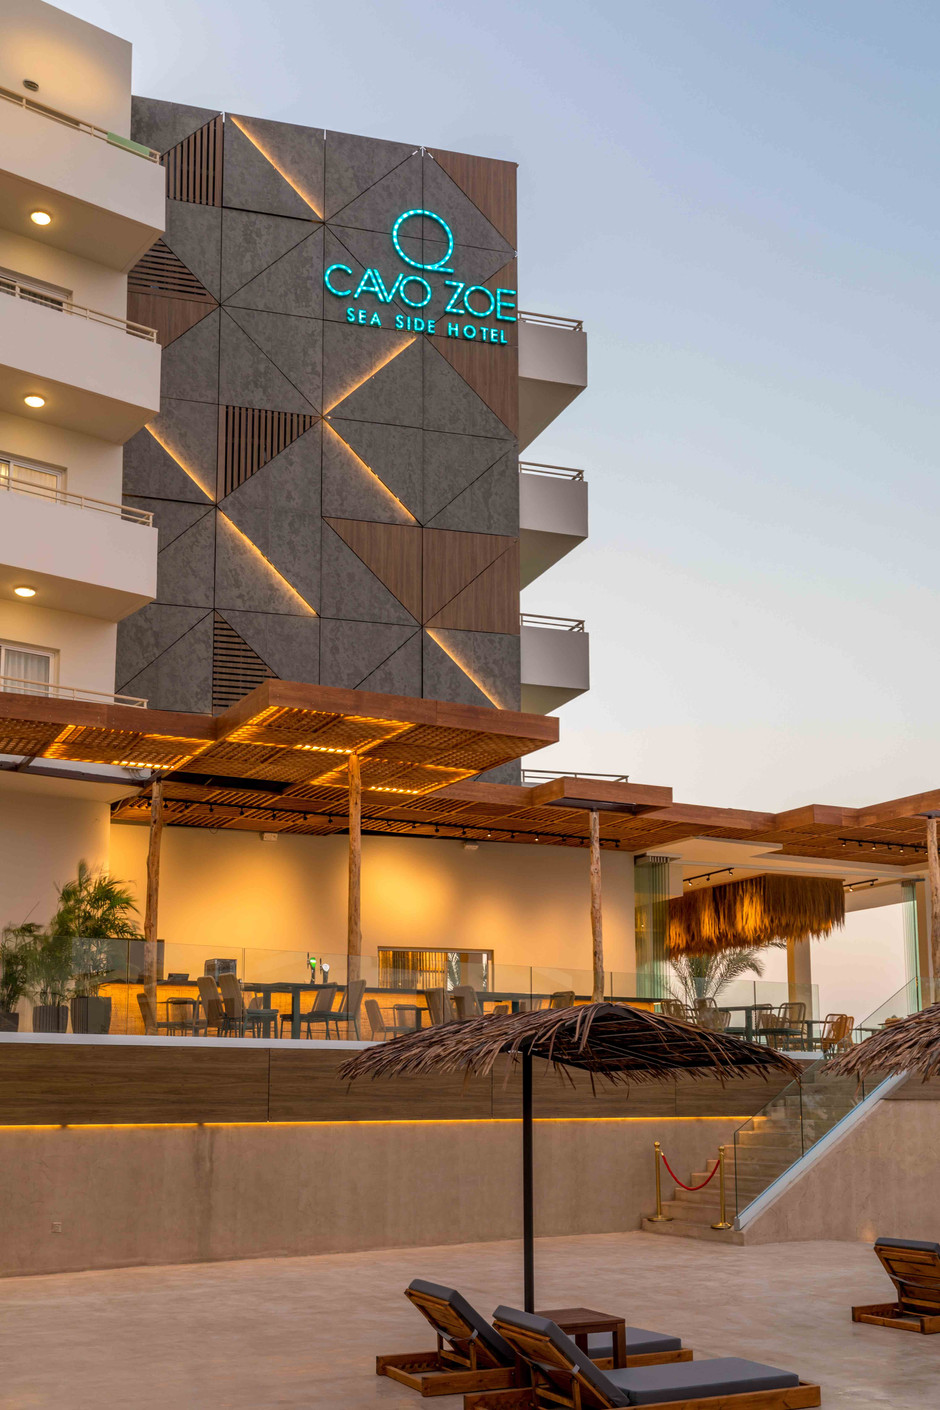 Cavo Zoe Seaside Hotel-4.jpg